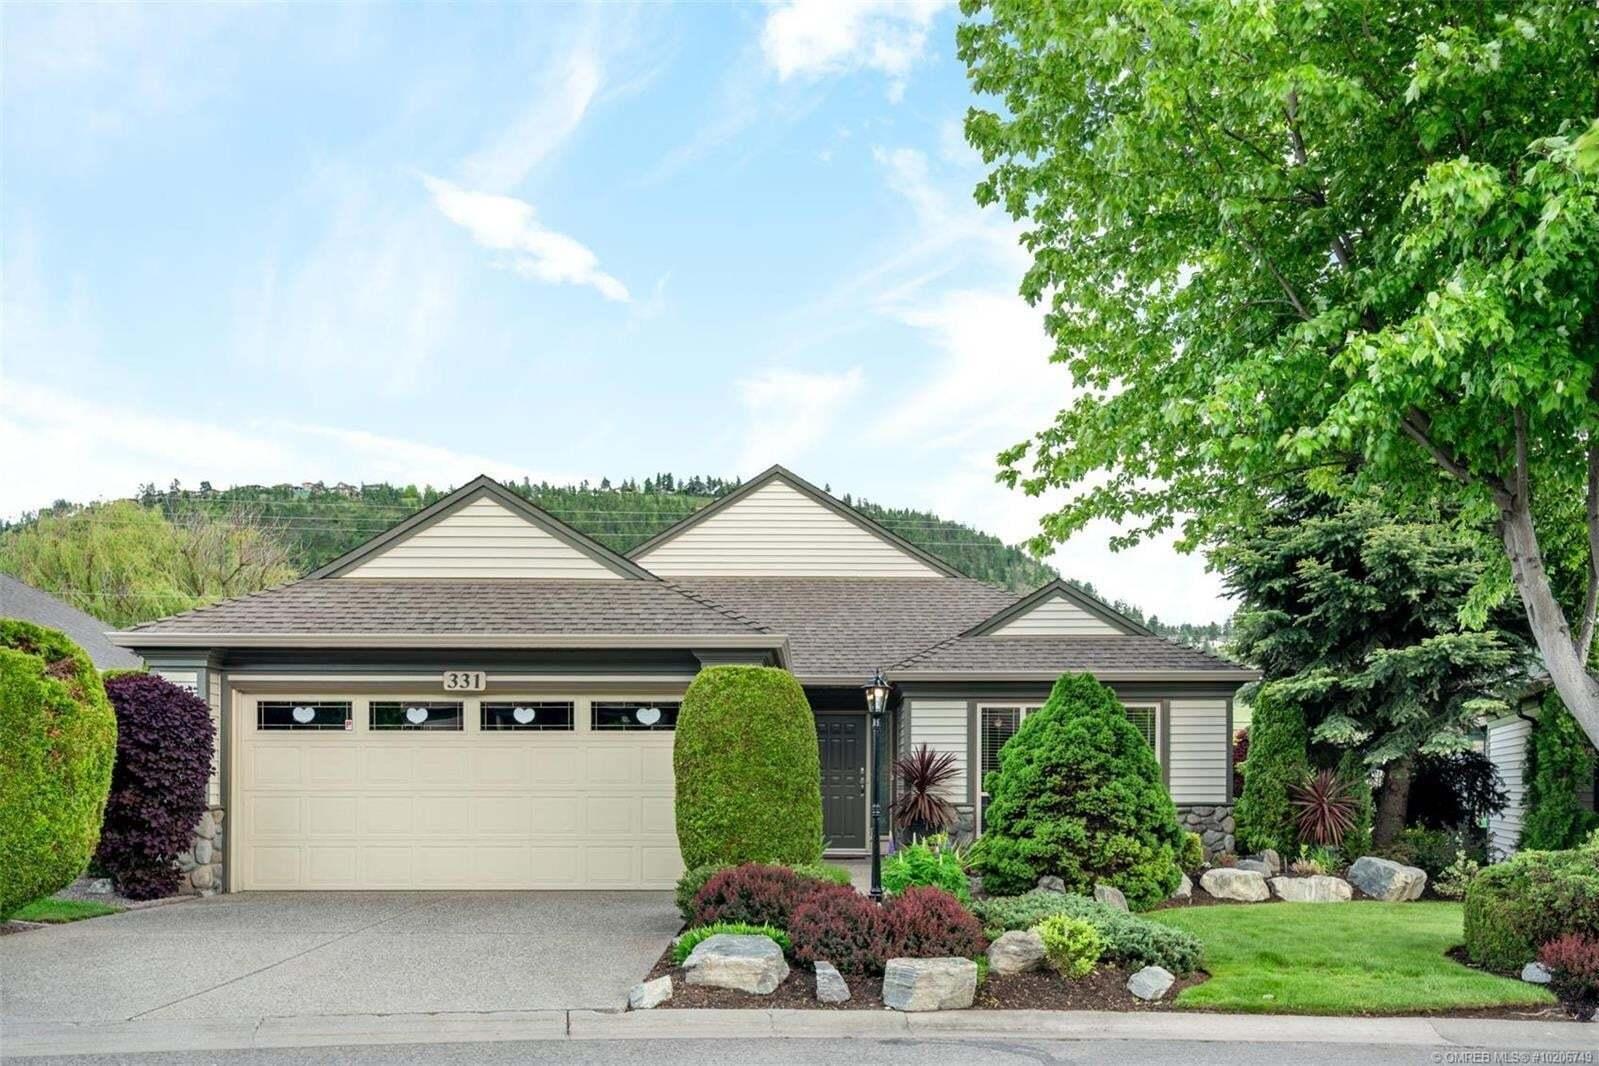 Townhouse for sale at 550 Yates Rd Kelowna British Columbia - MLS: 10206749